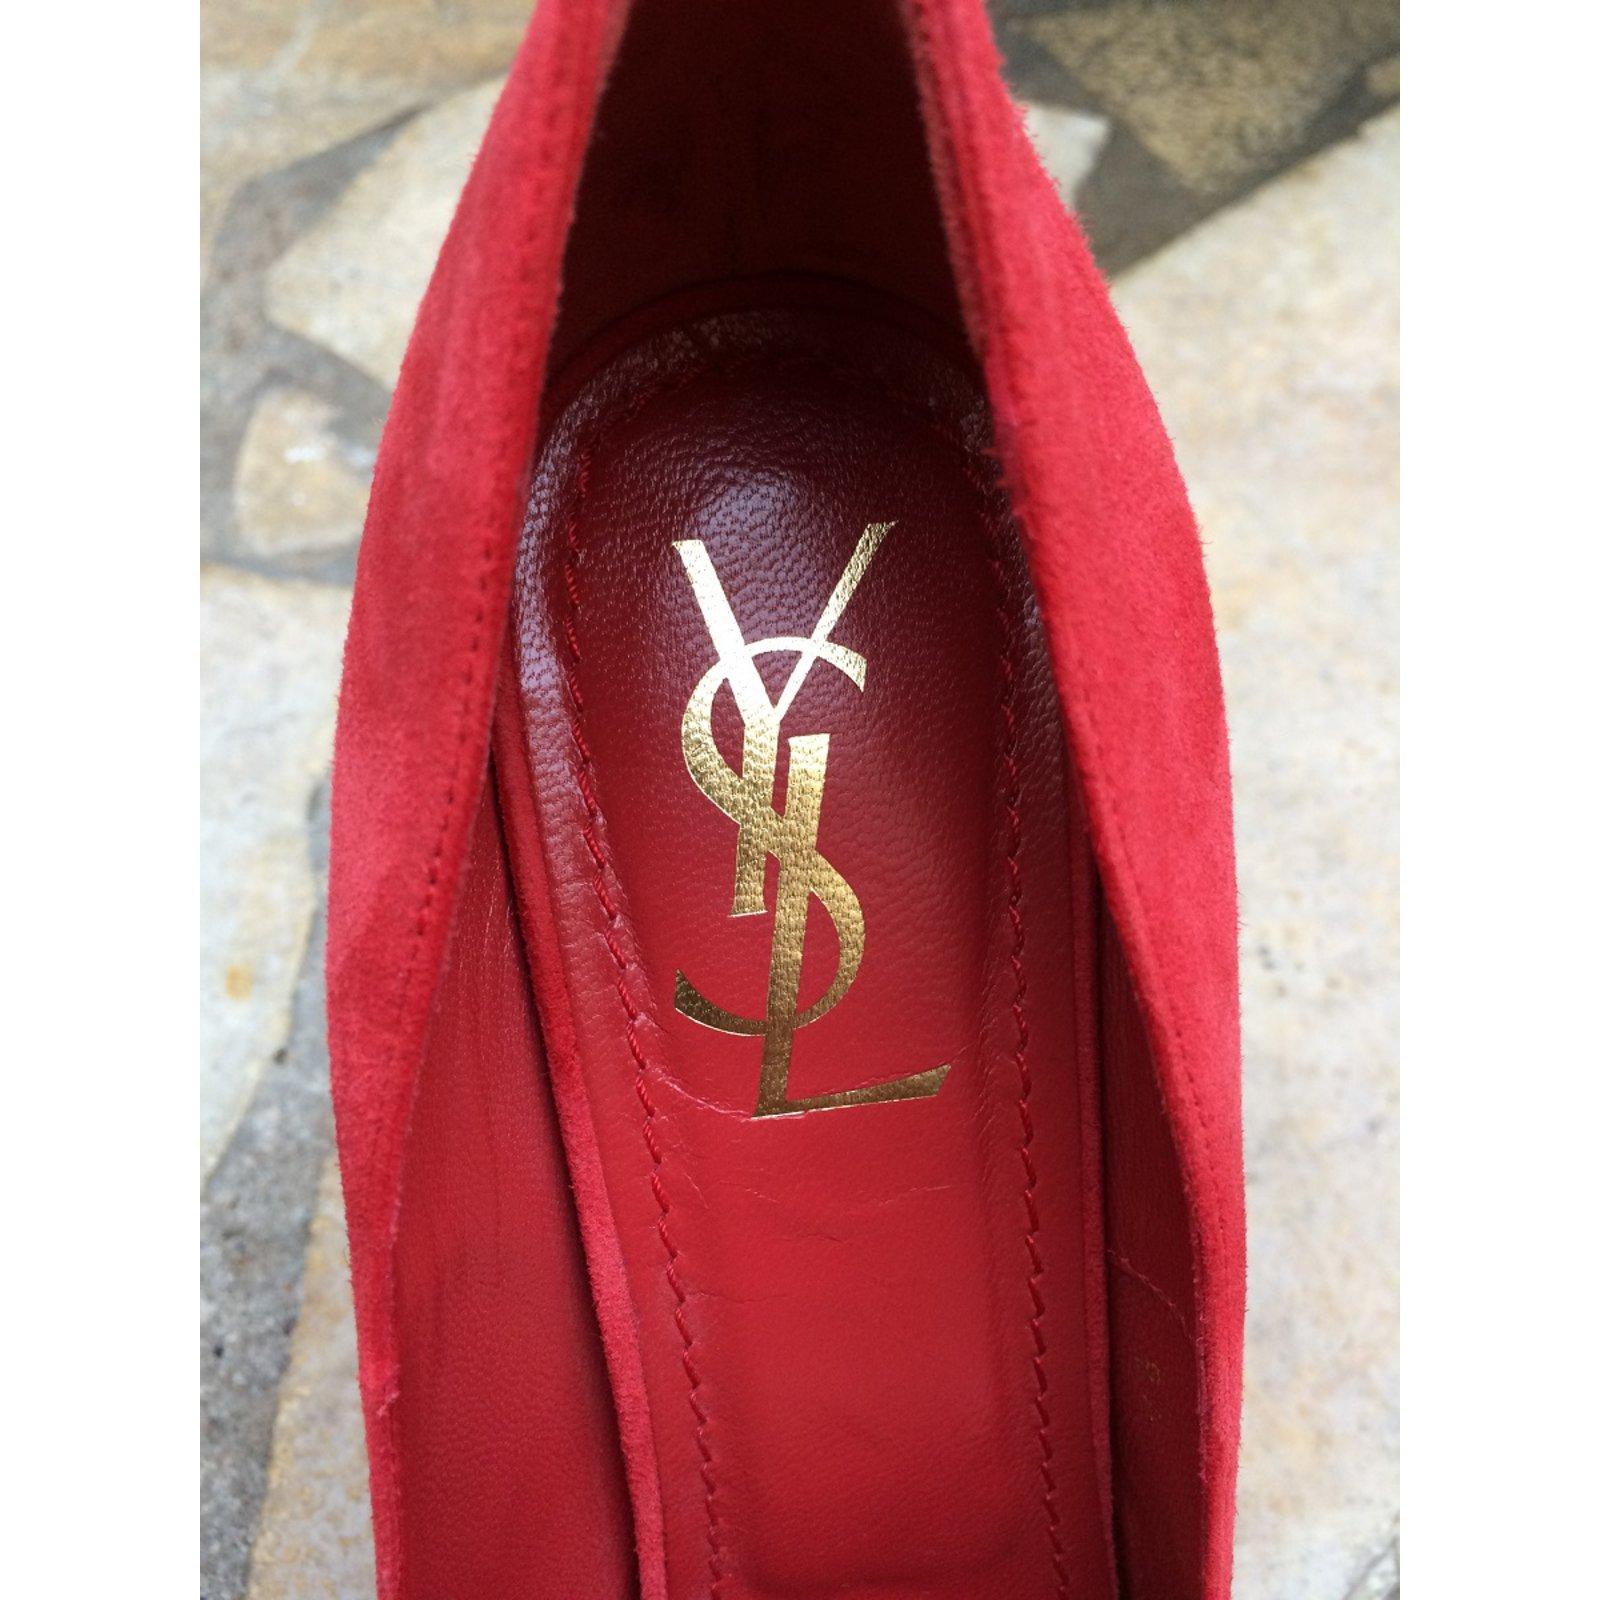 09fa3ba1bdb6c Facebook · Pin This. Yves Saint Laurent Heels Heels Leather Red ref.49702